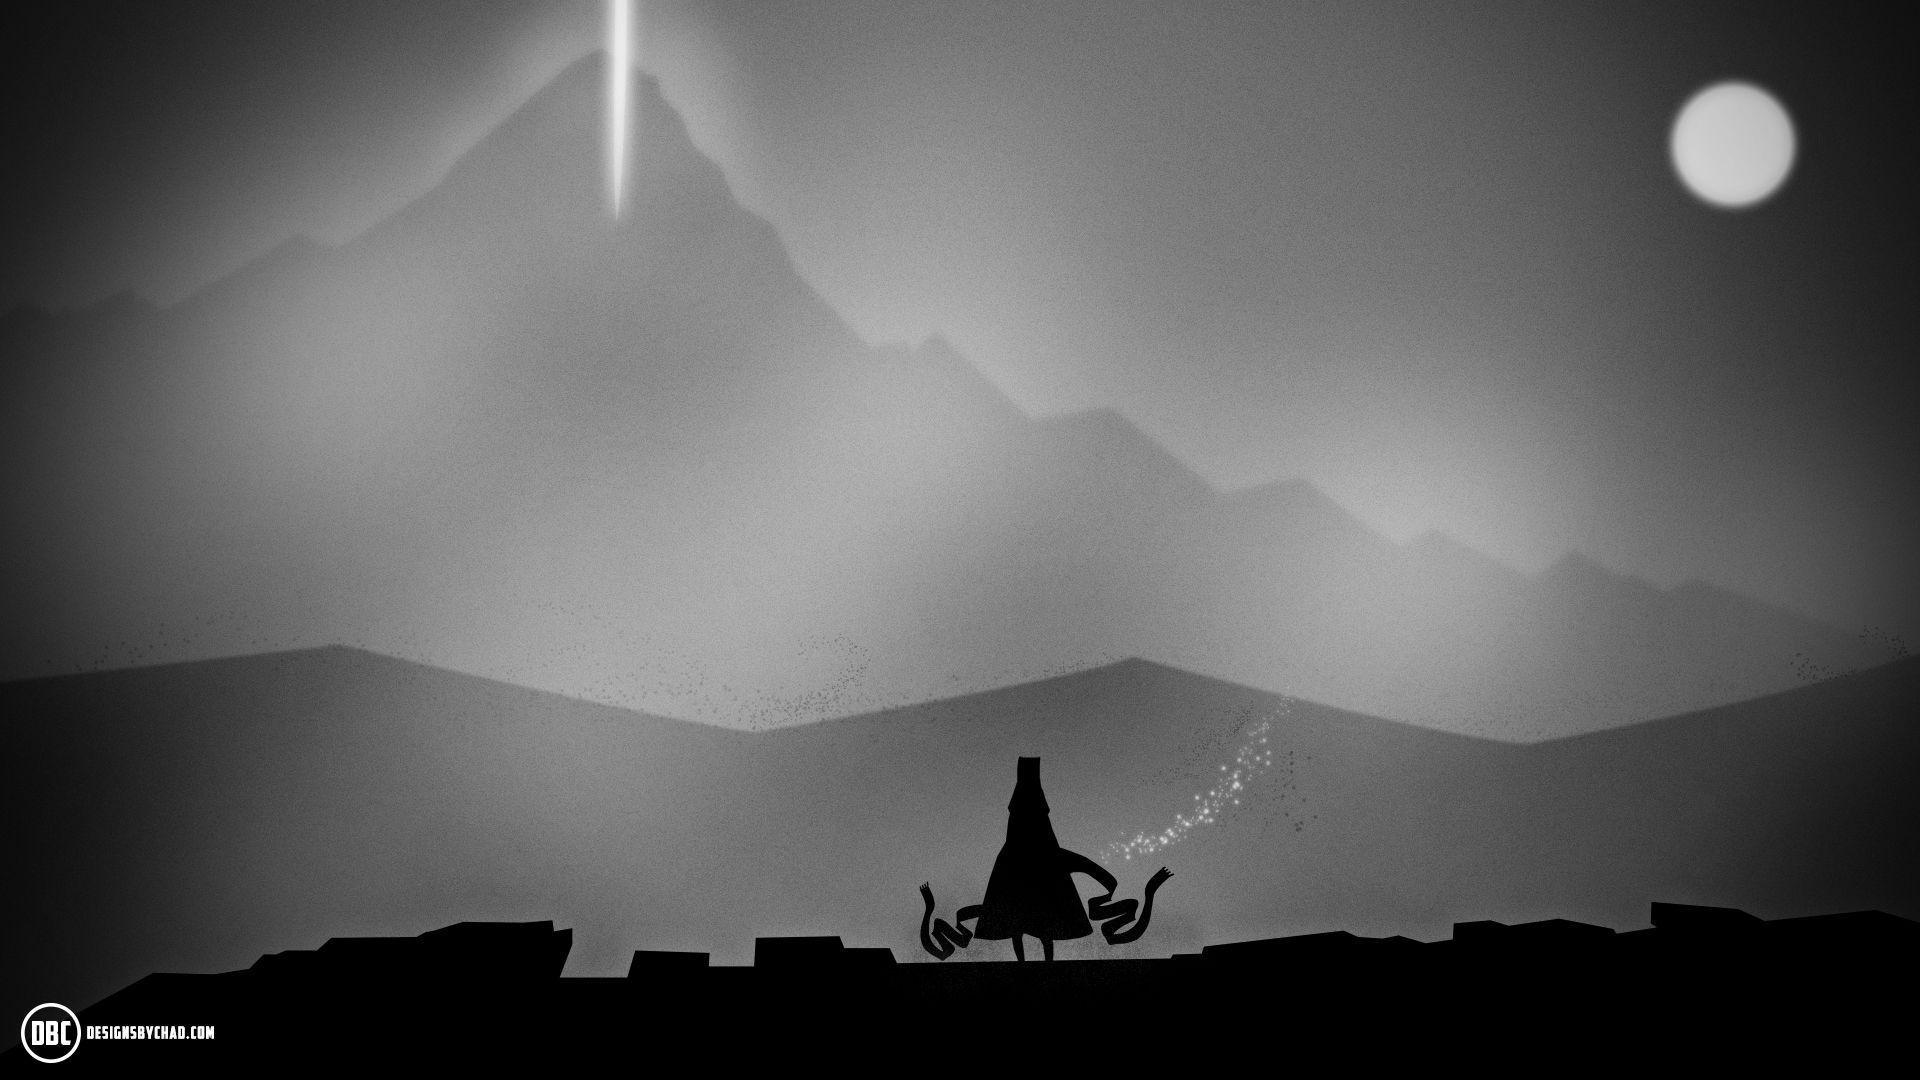 Journey Limbo Mashup Wallpaper by Chadski51 on DeviantArt